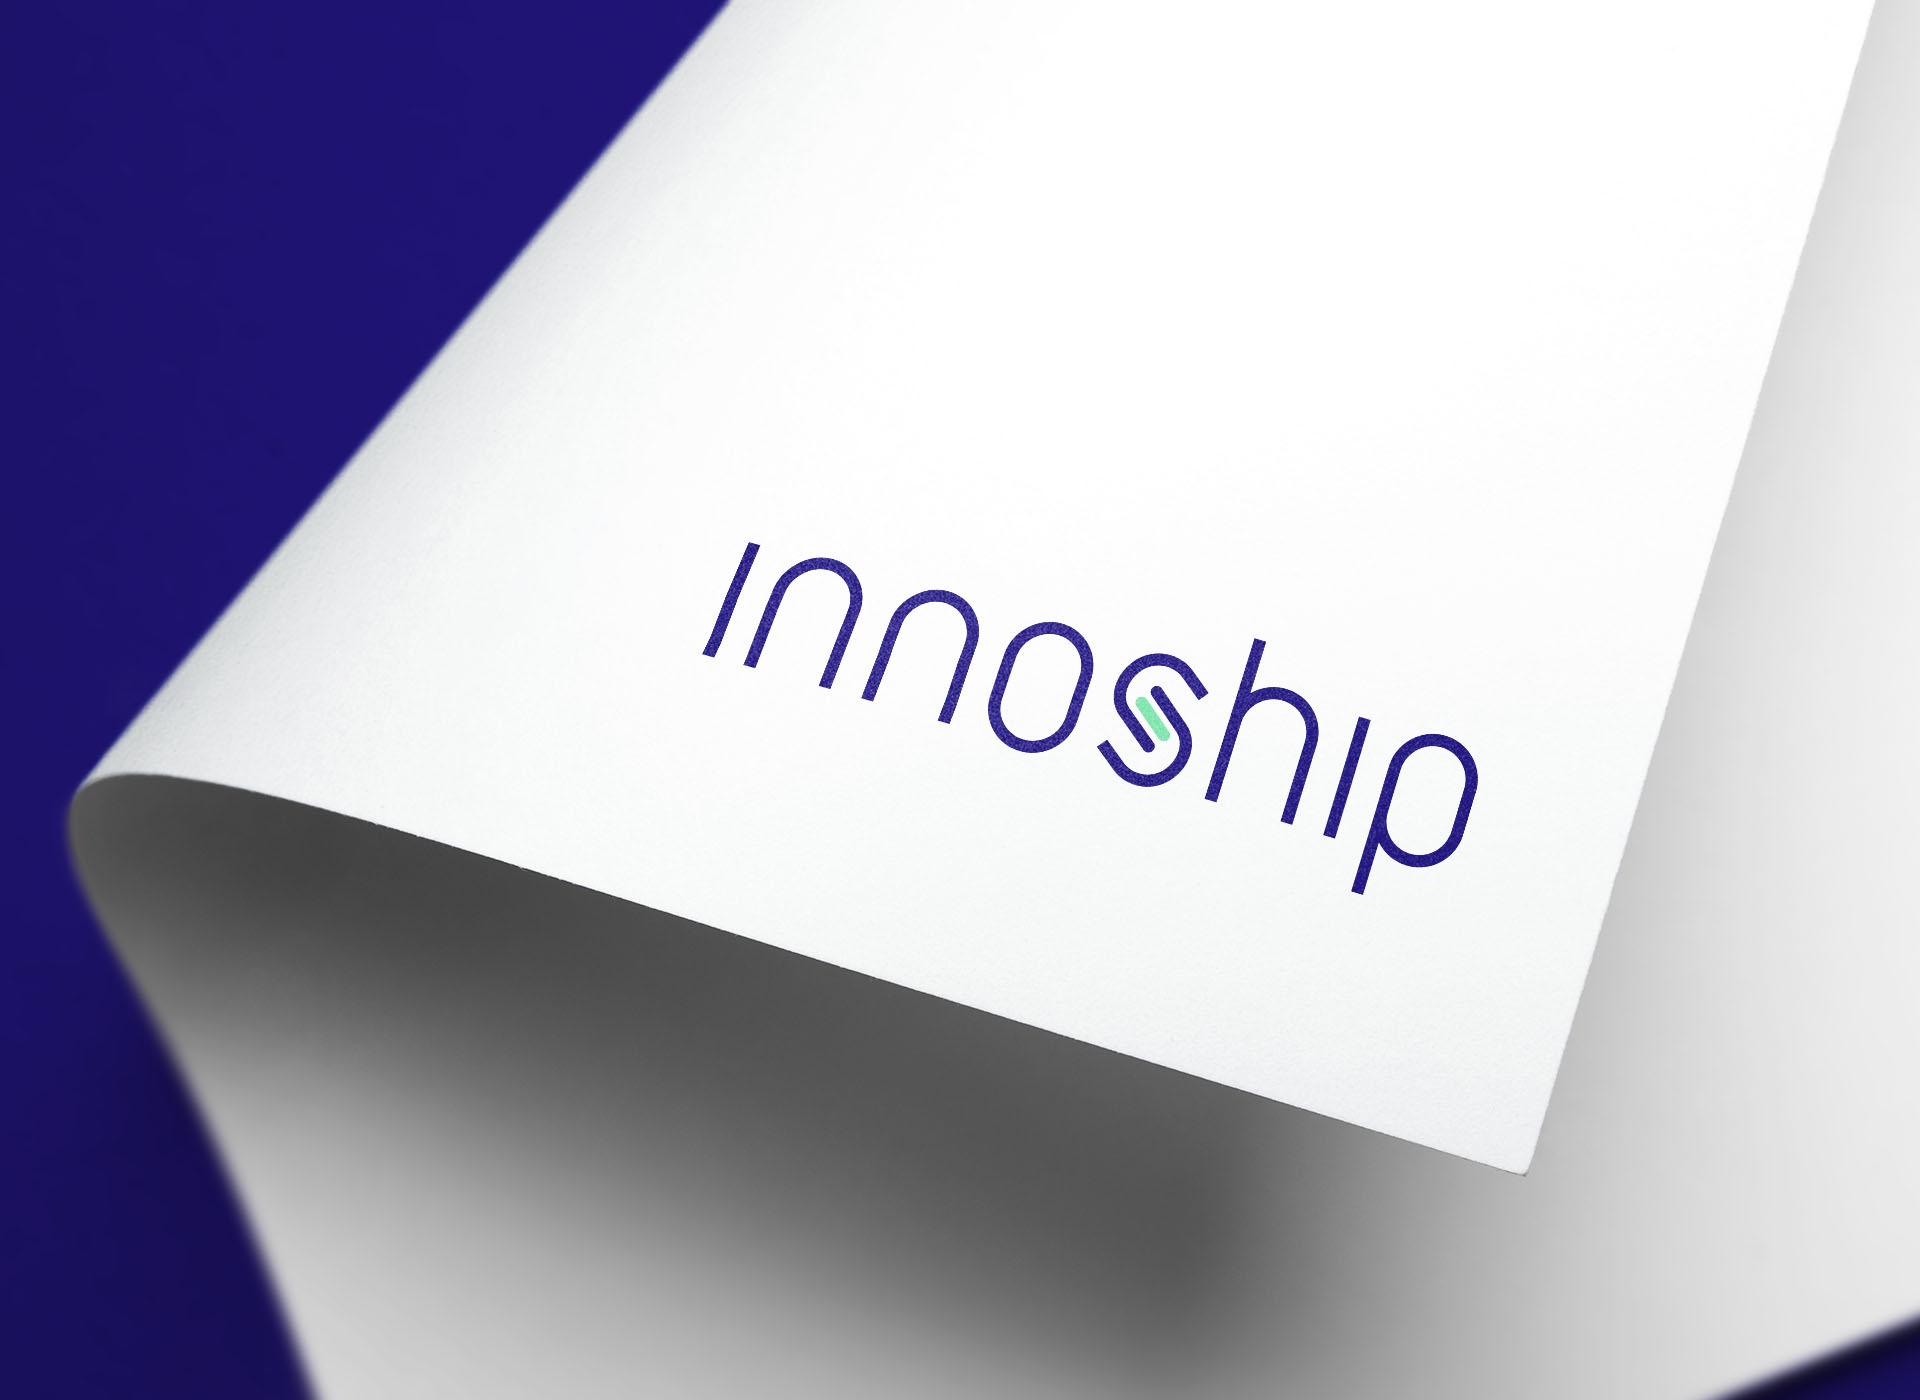 Innoship portofoliu inoveo paper